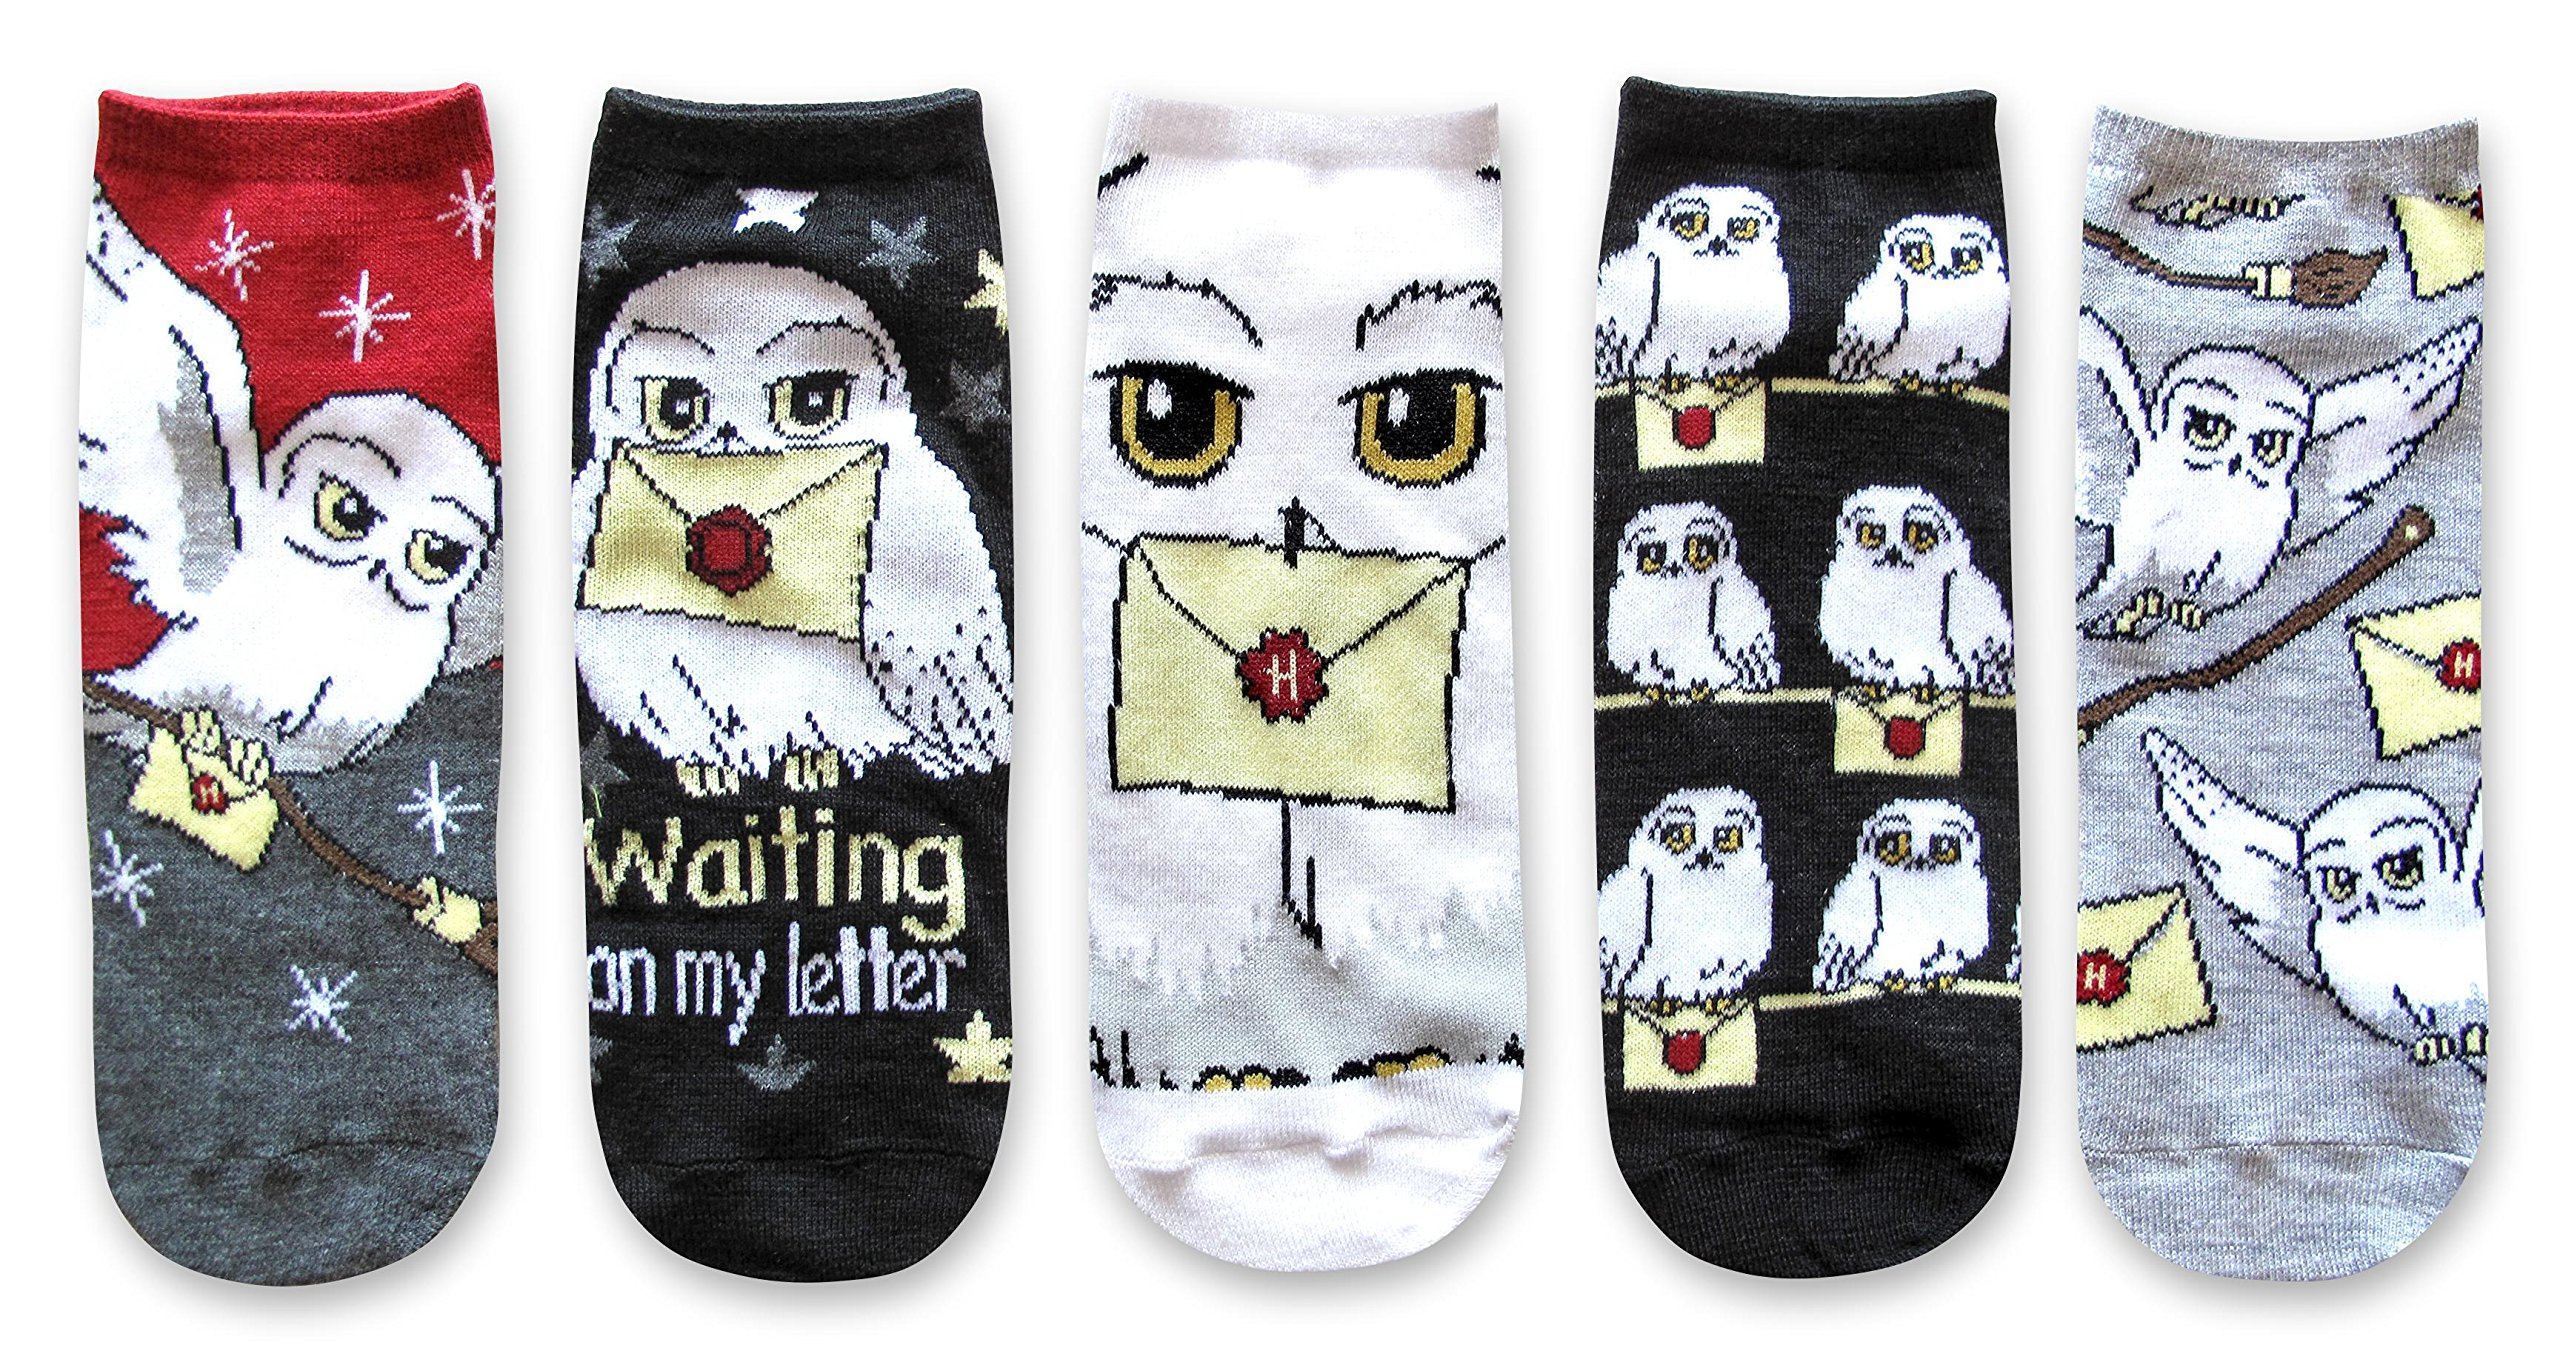 Hyp Harry Potter Hedwig Hogwarts Letter Juniors/Womens 5 Pack Ankle Socks Size 4-10